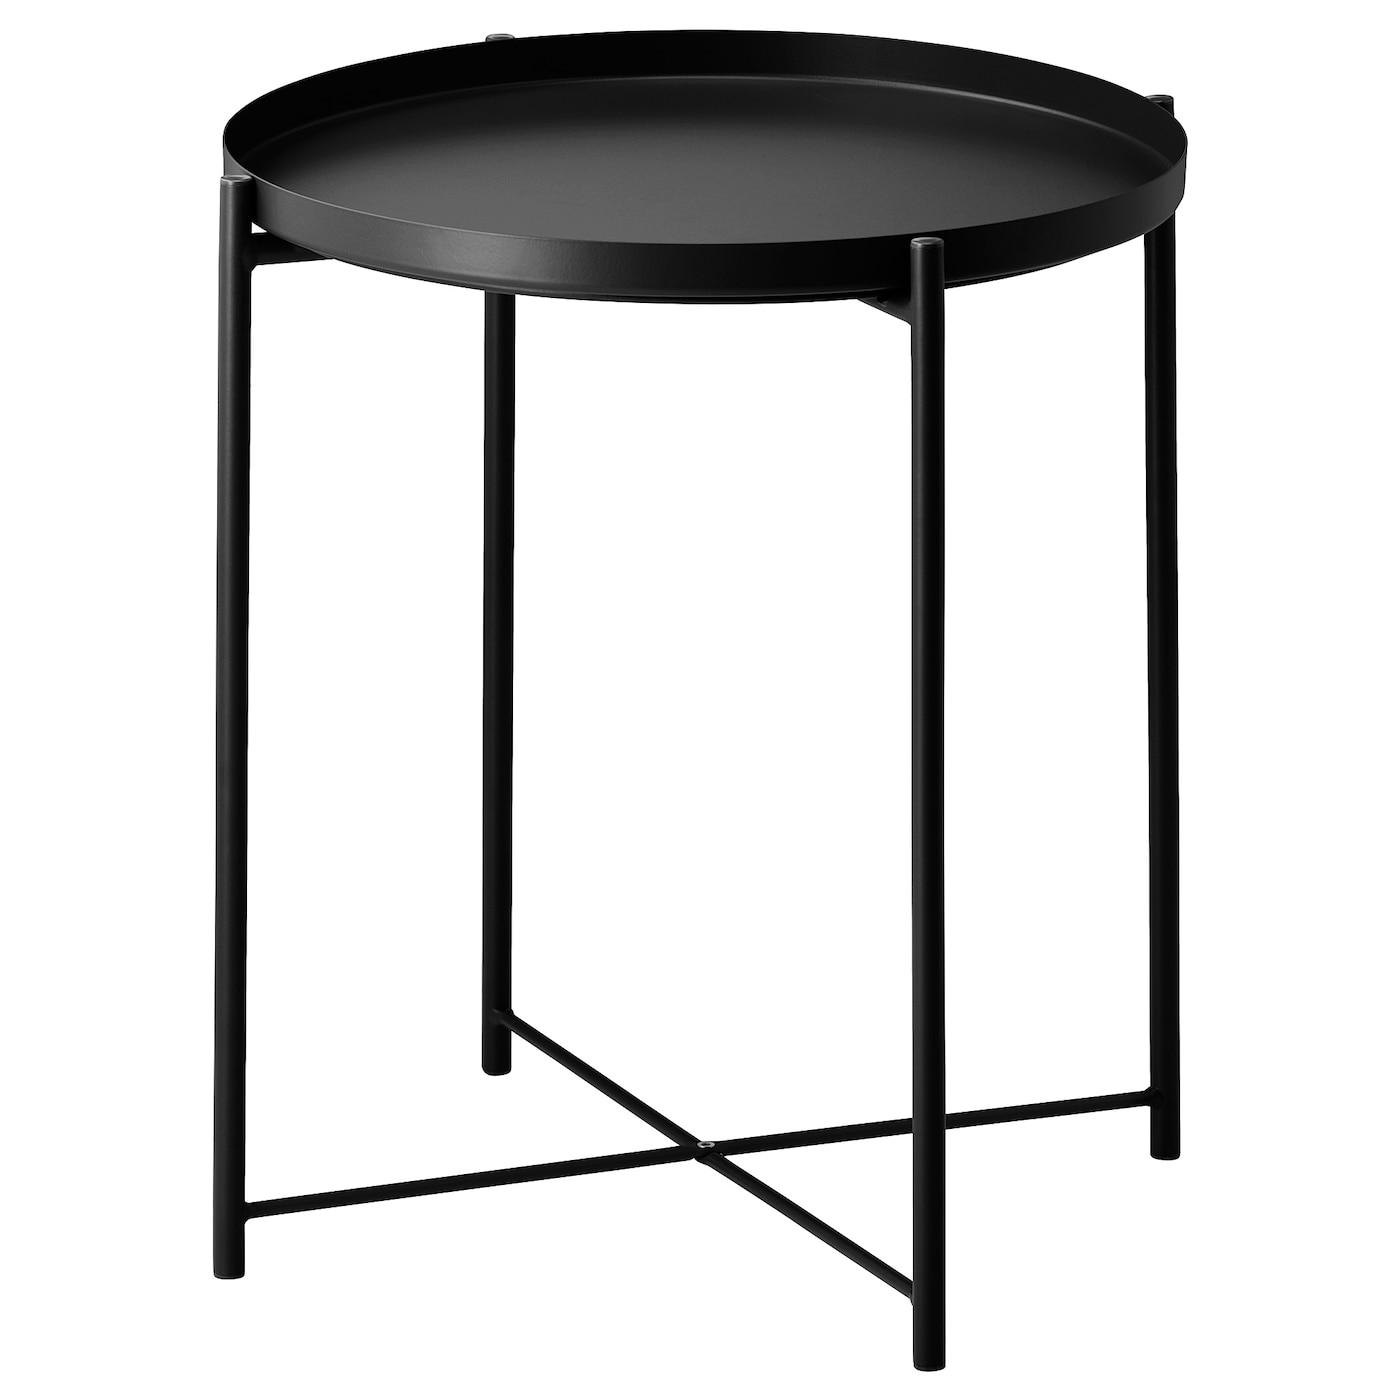 - GLADOM Tray Table, Black, 17 1/2x20 5/8